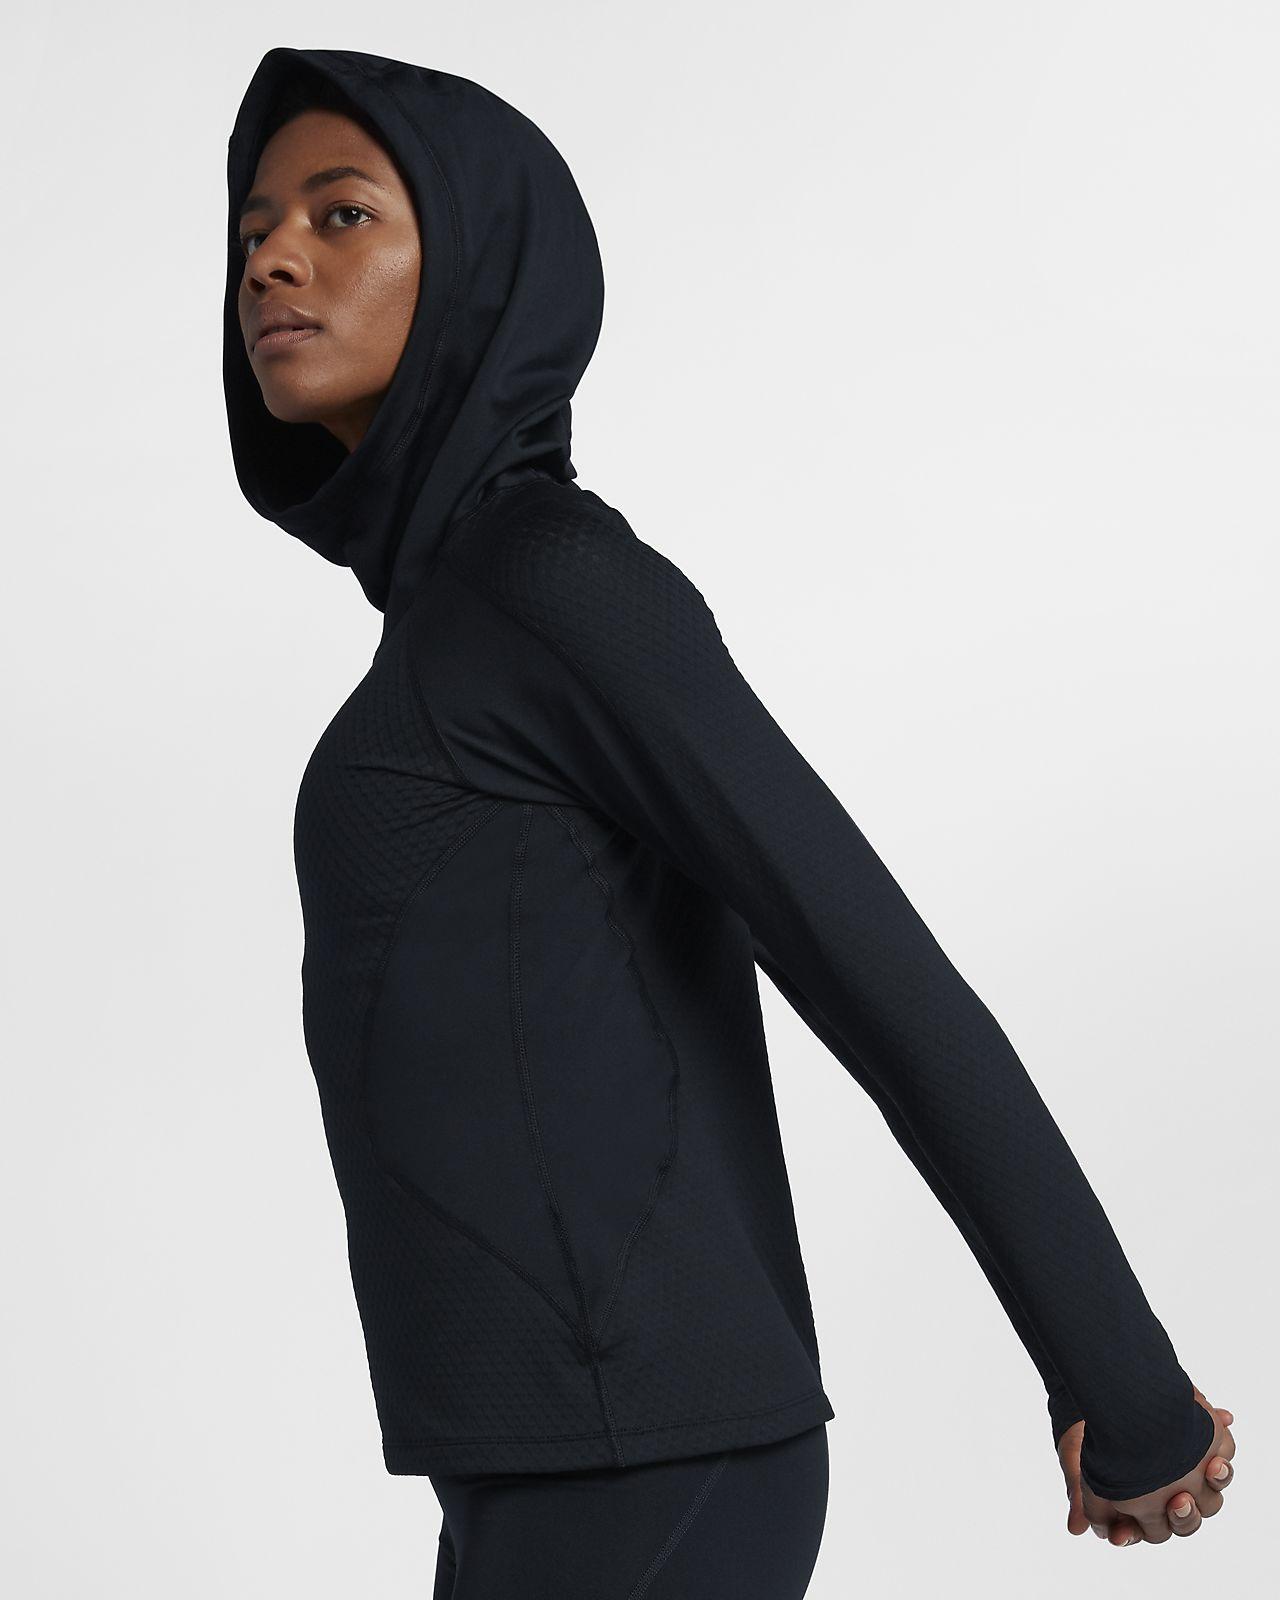 Nike Pro HyperWarm Trainings-Hoodie mit Kapuze für Damen